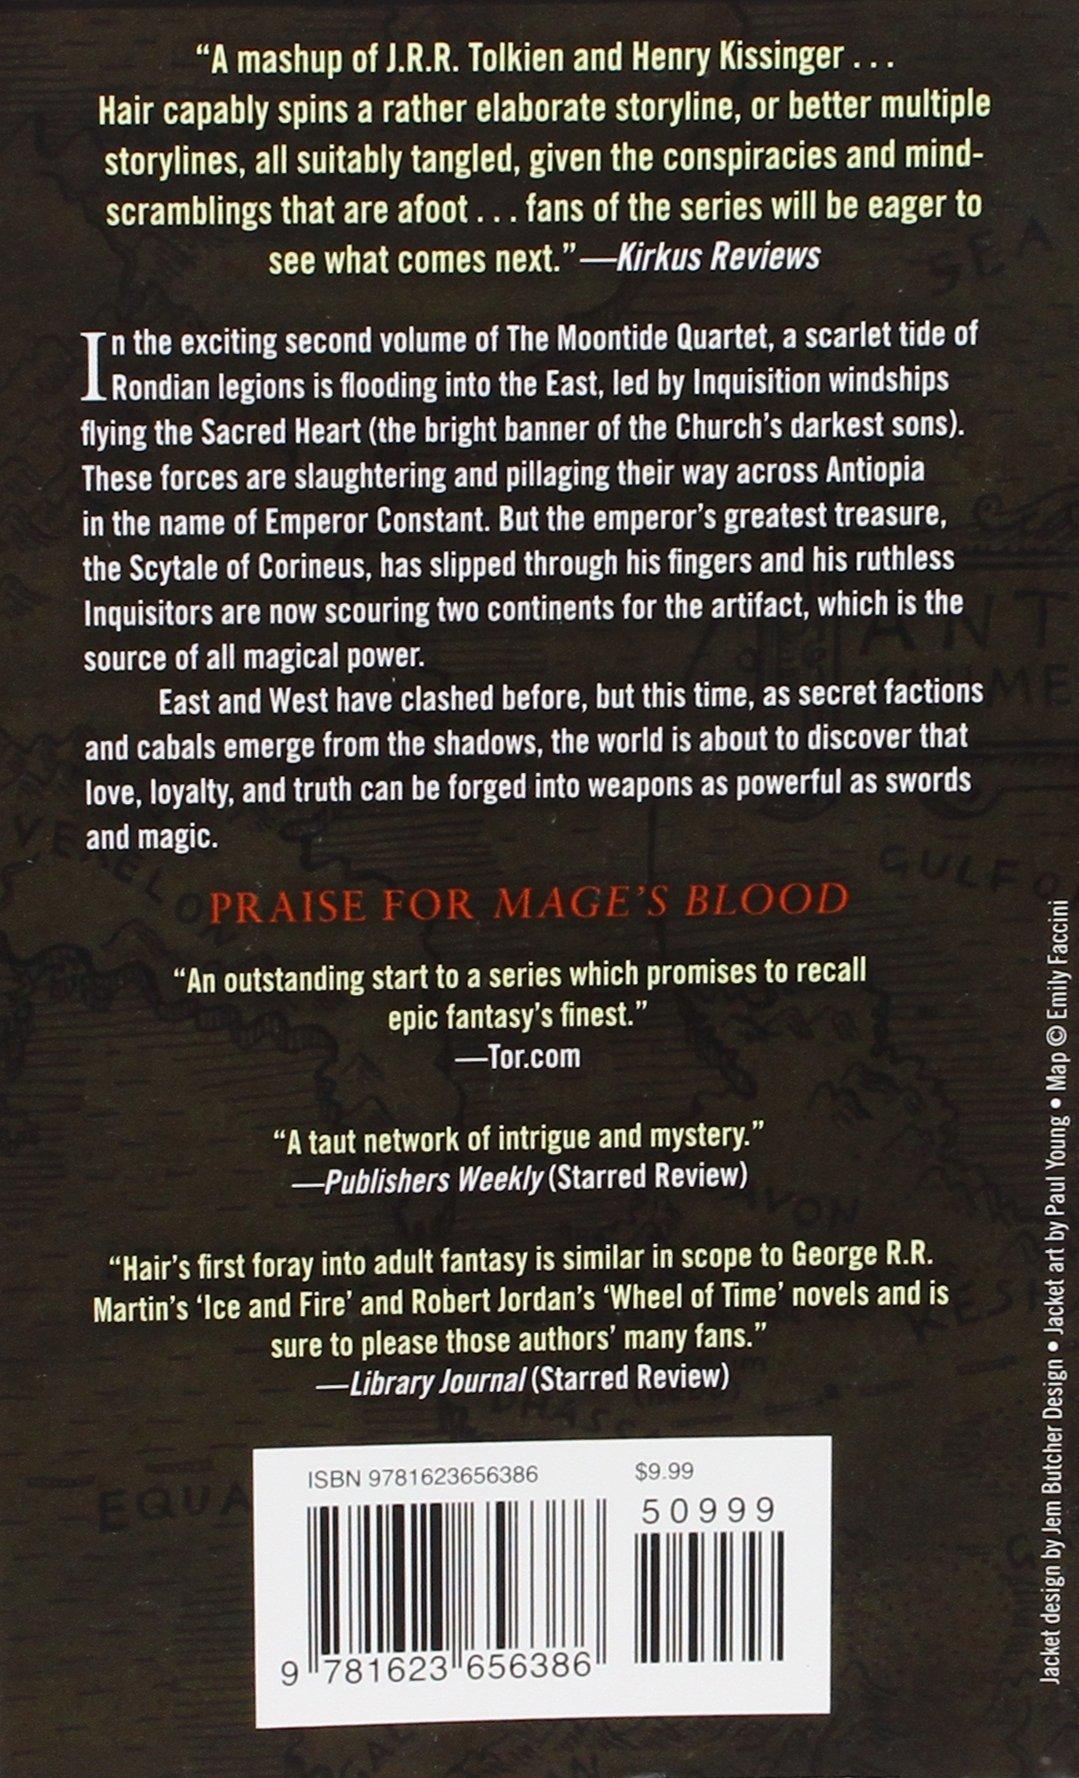 Scarlet Tides (the Moontide Quartet): David Hair: 9781623656386:  Amazon: Books